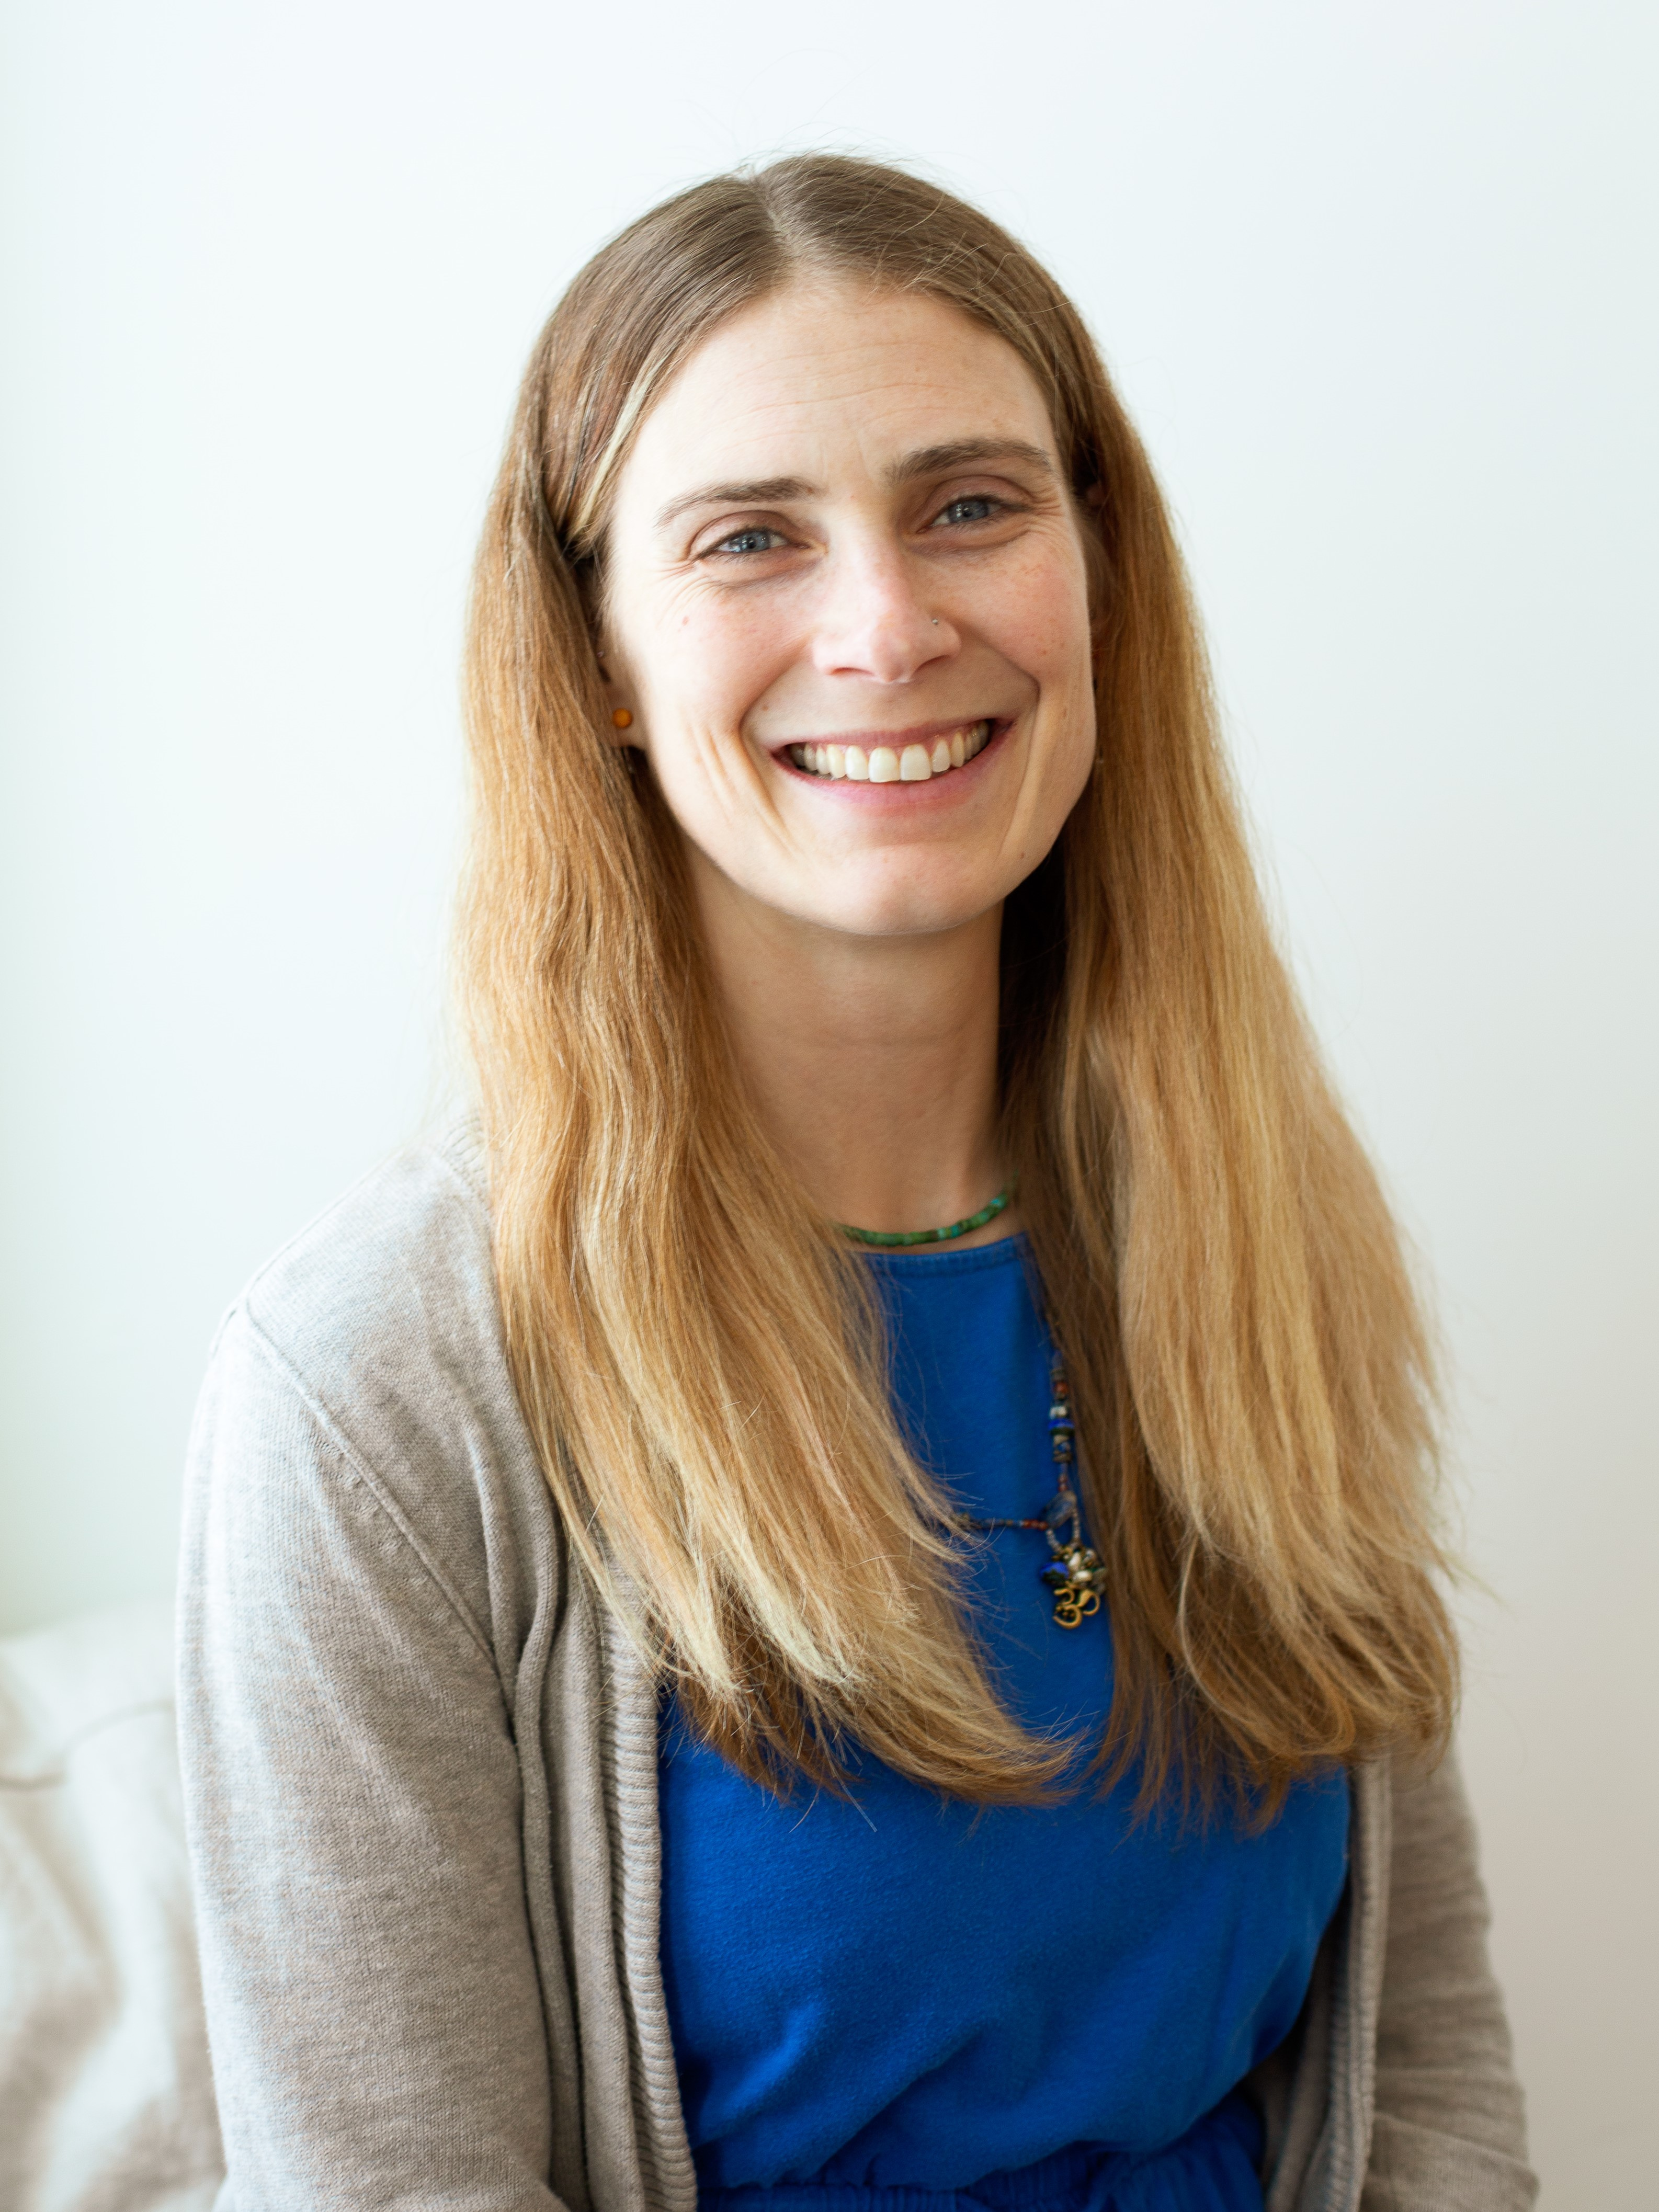 Elizabeth Chalen | Volunteer & Programs Coordinator